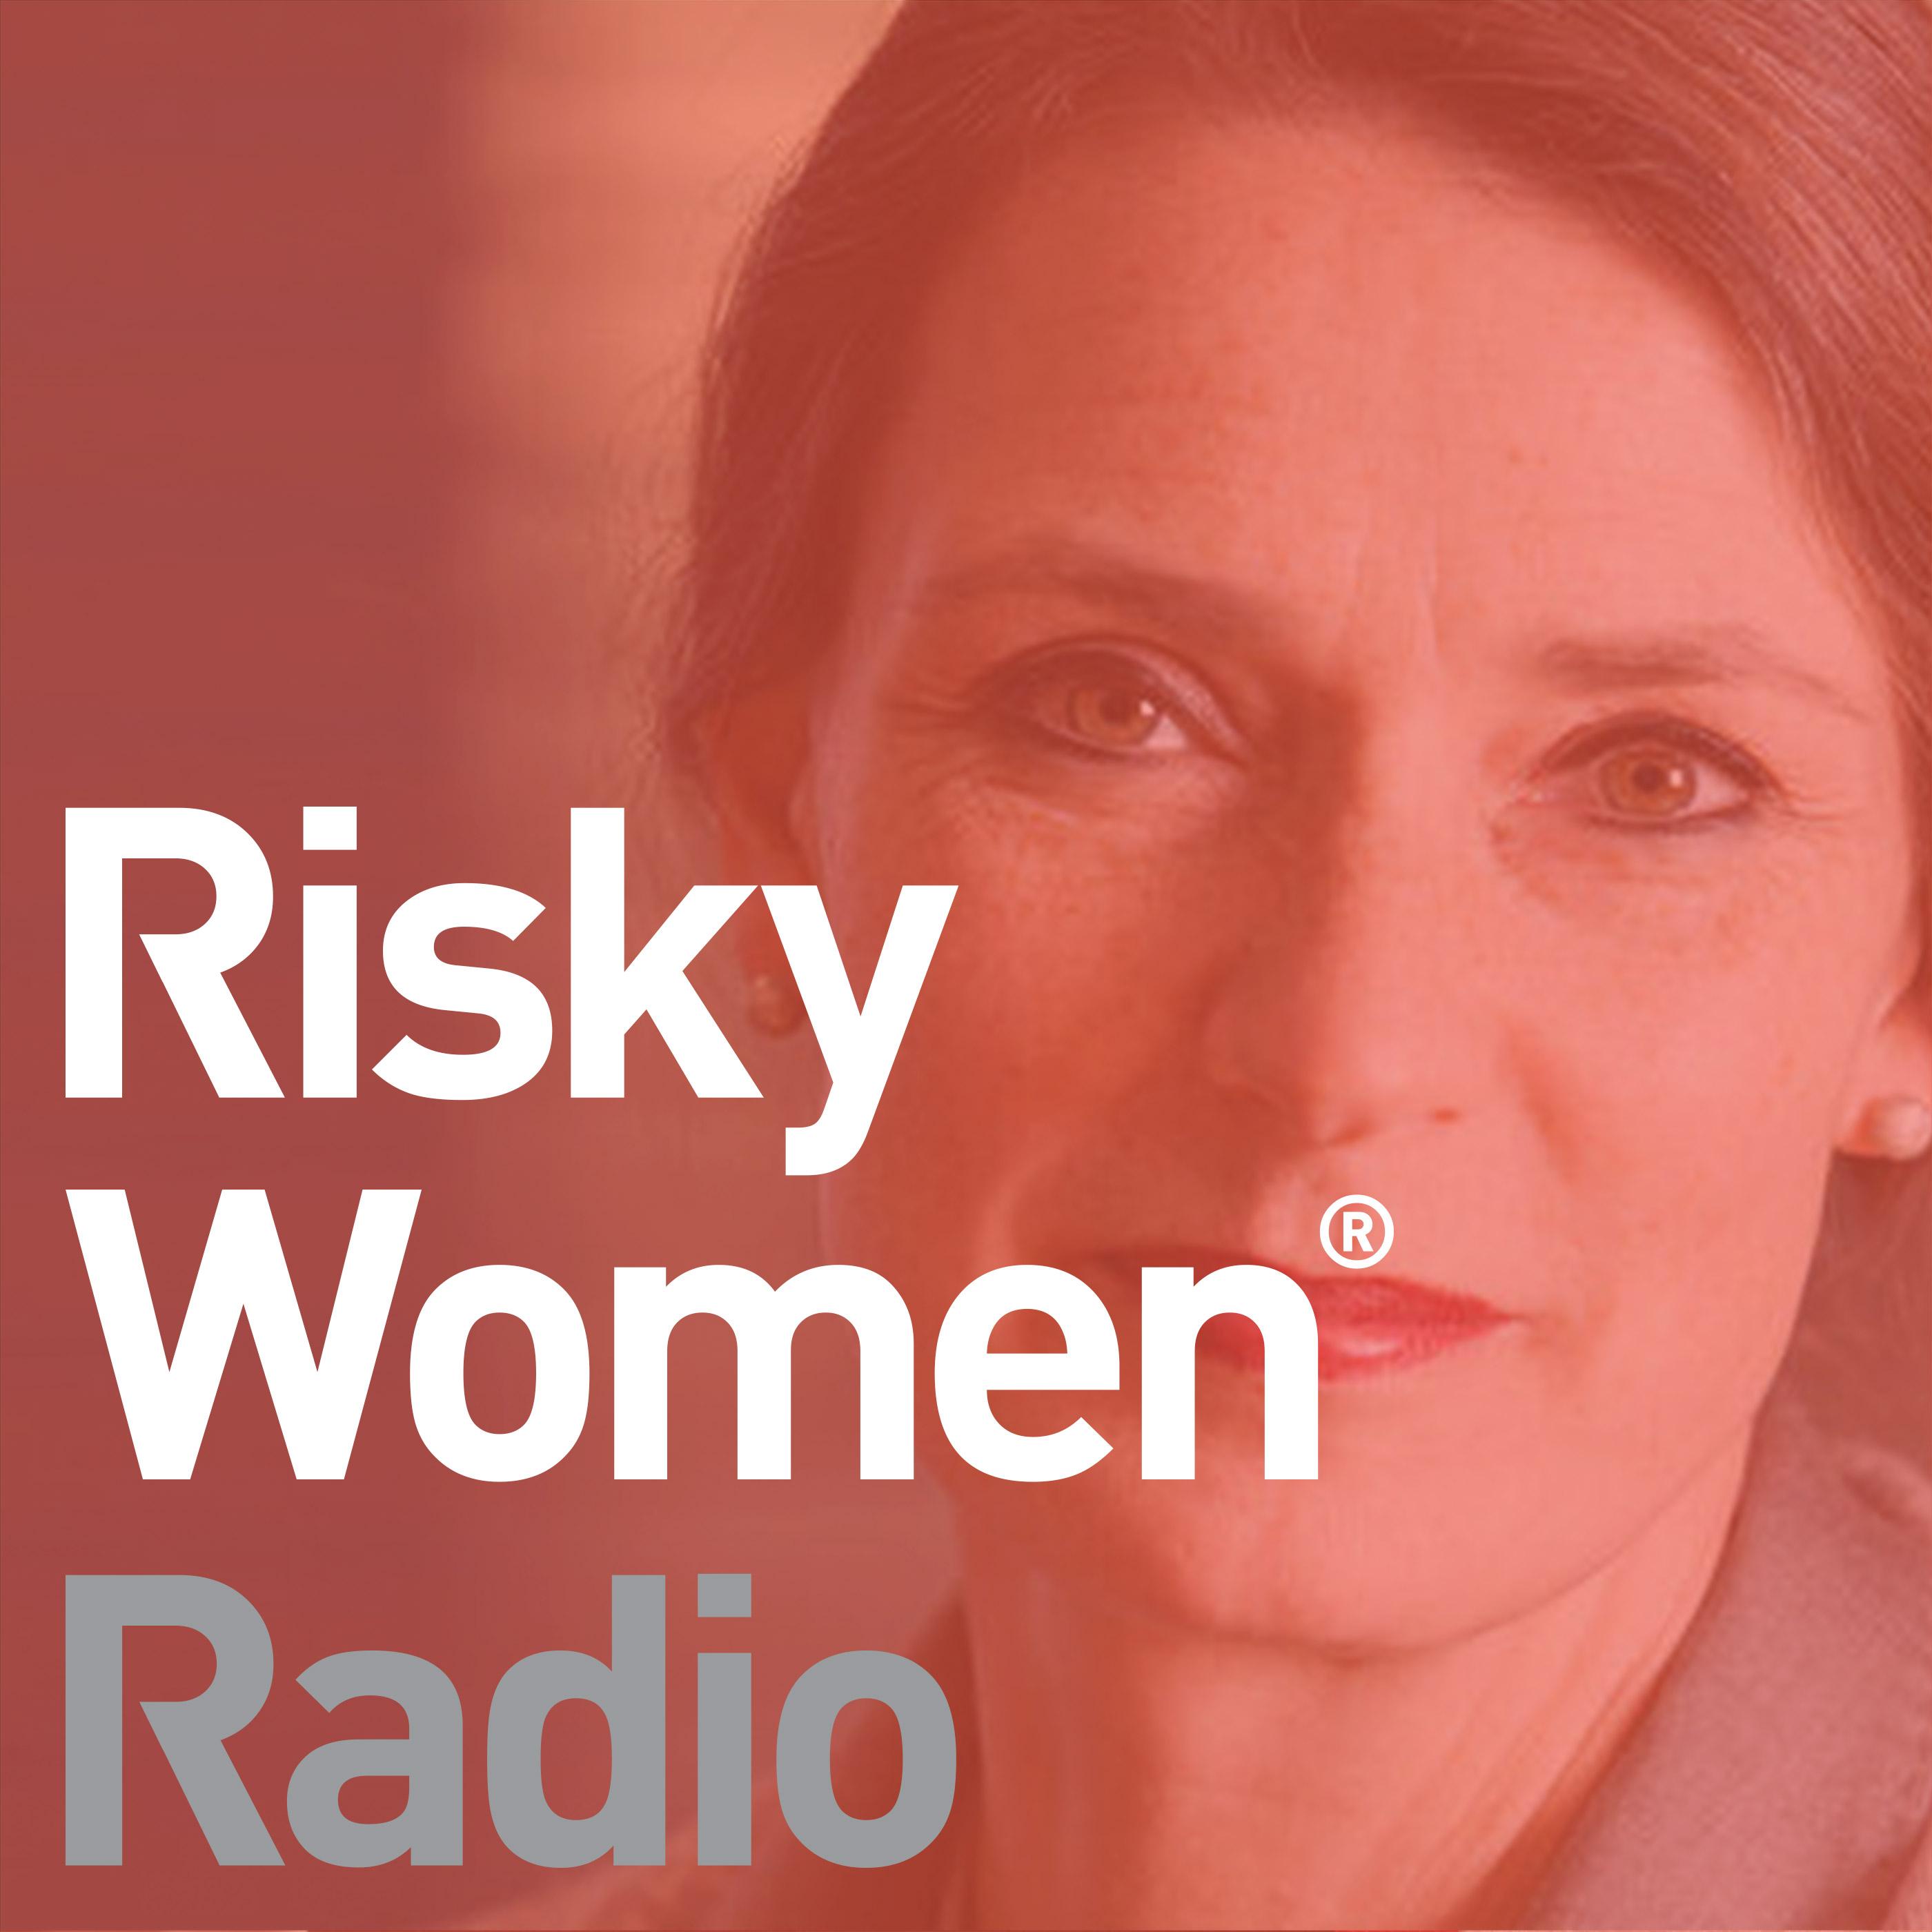 Adan Y Eva 1X10 Porn best risky women radio podcasts   most downloaded episodes